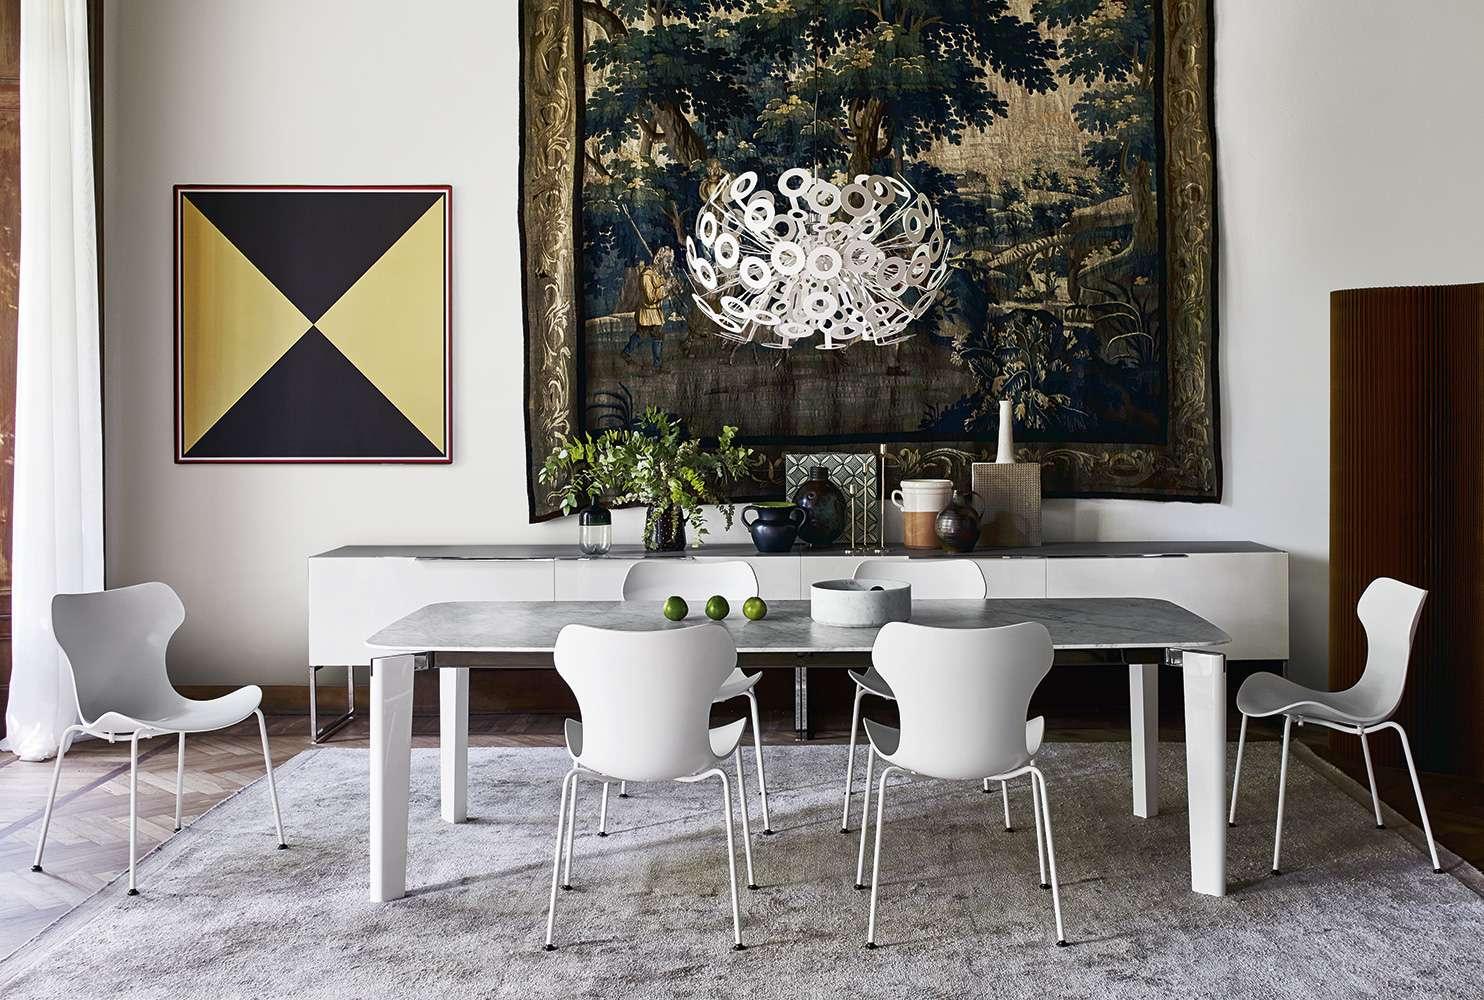 OSKAR design par Vincent Van Duysen